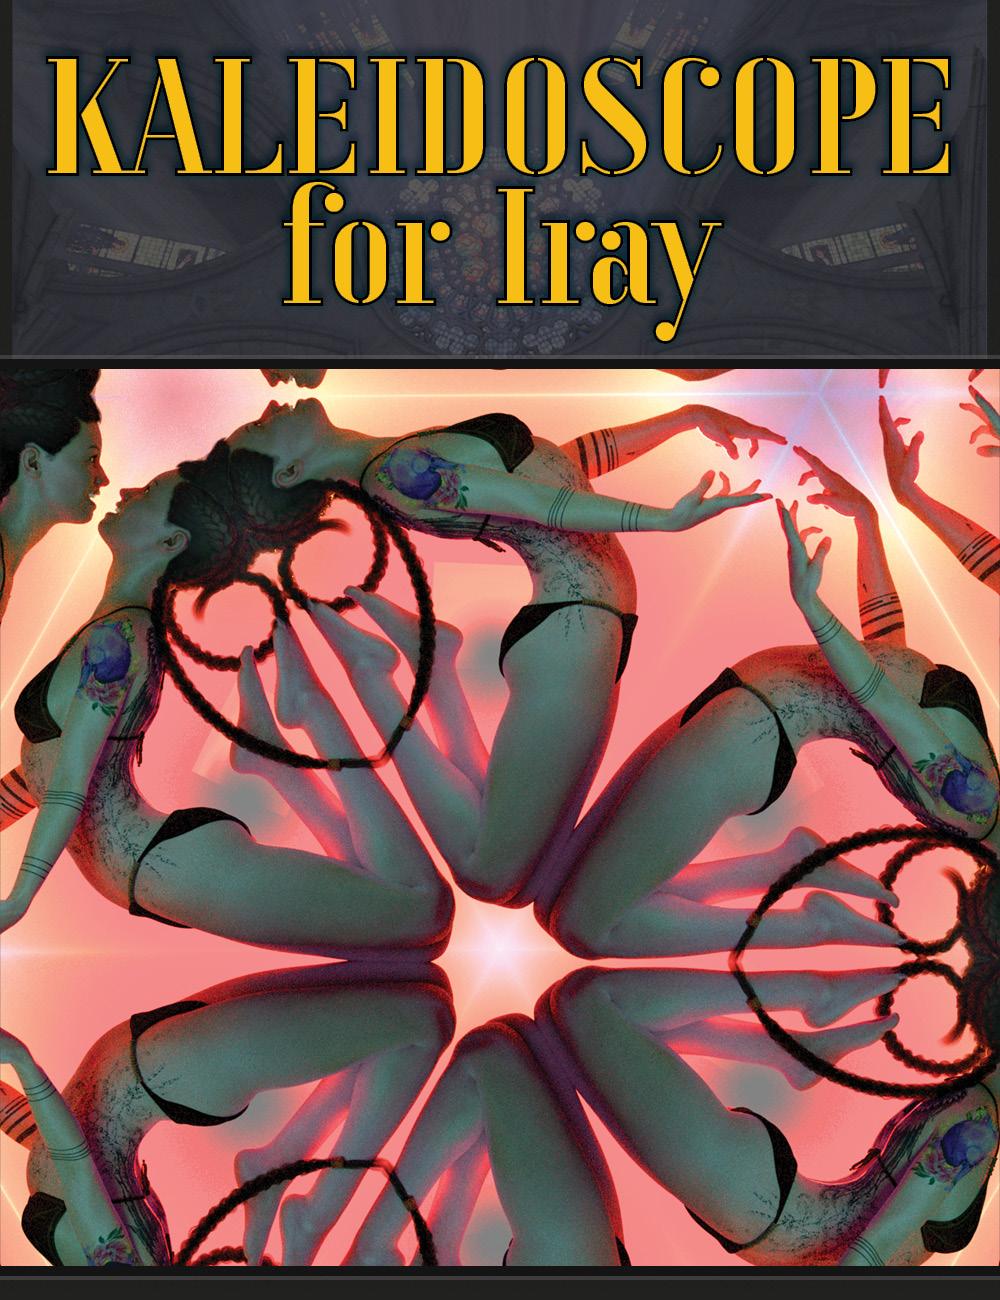 Kaleidoscope for Iray by: Marshian, 3D Models by Daz 3D